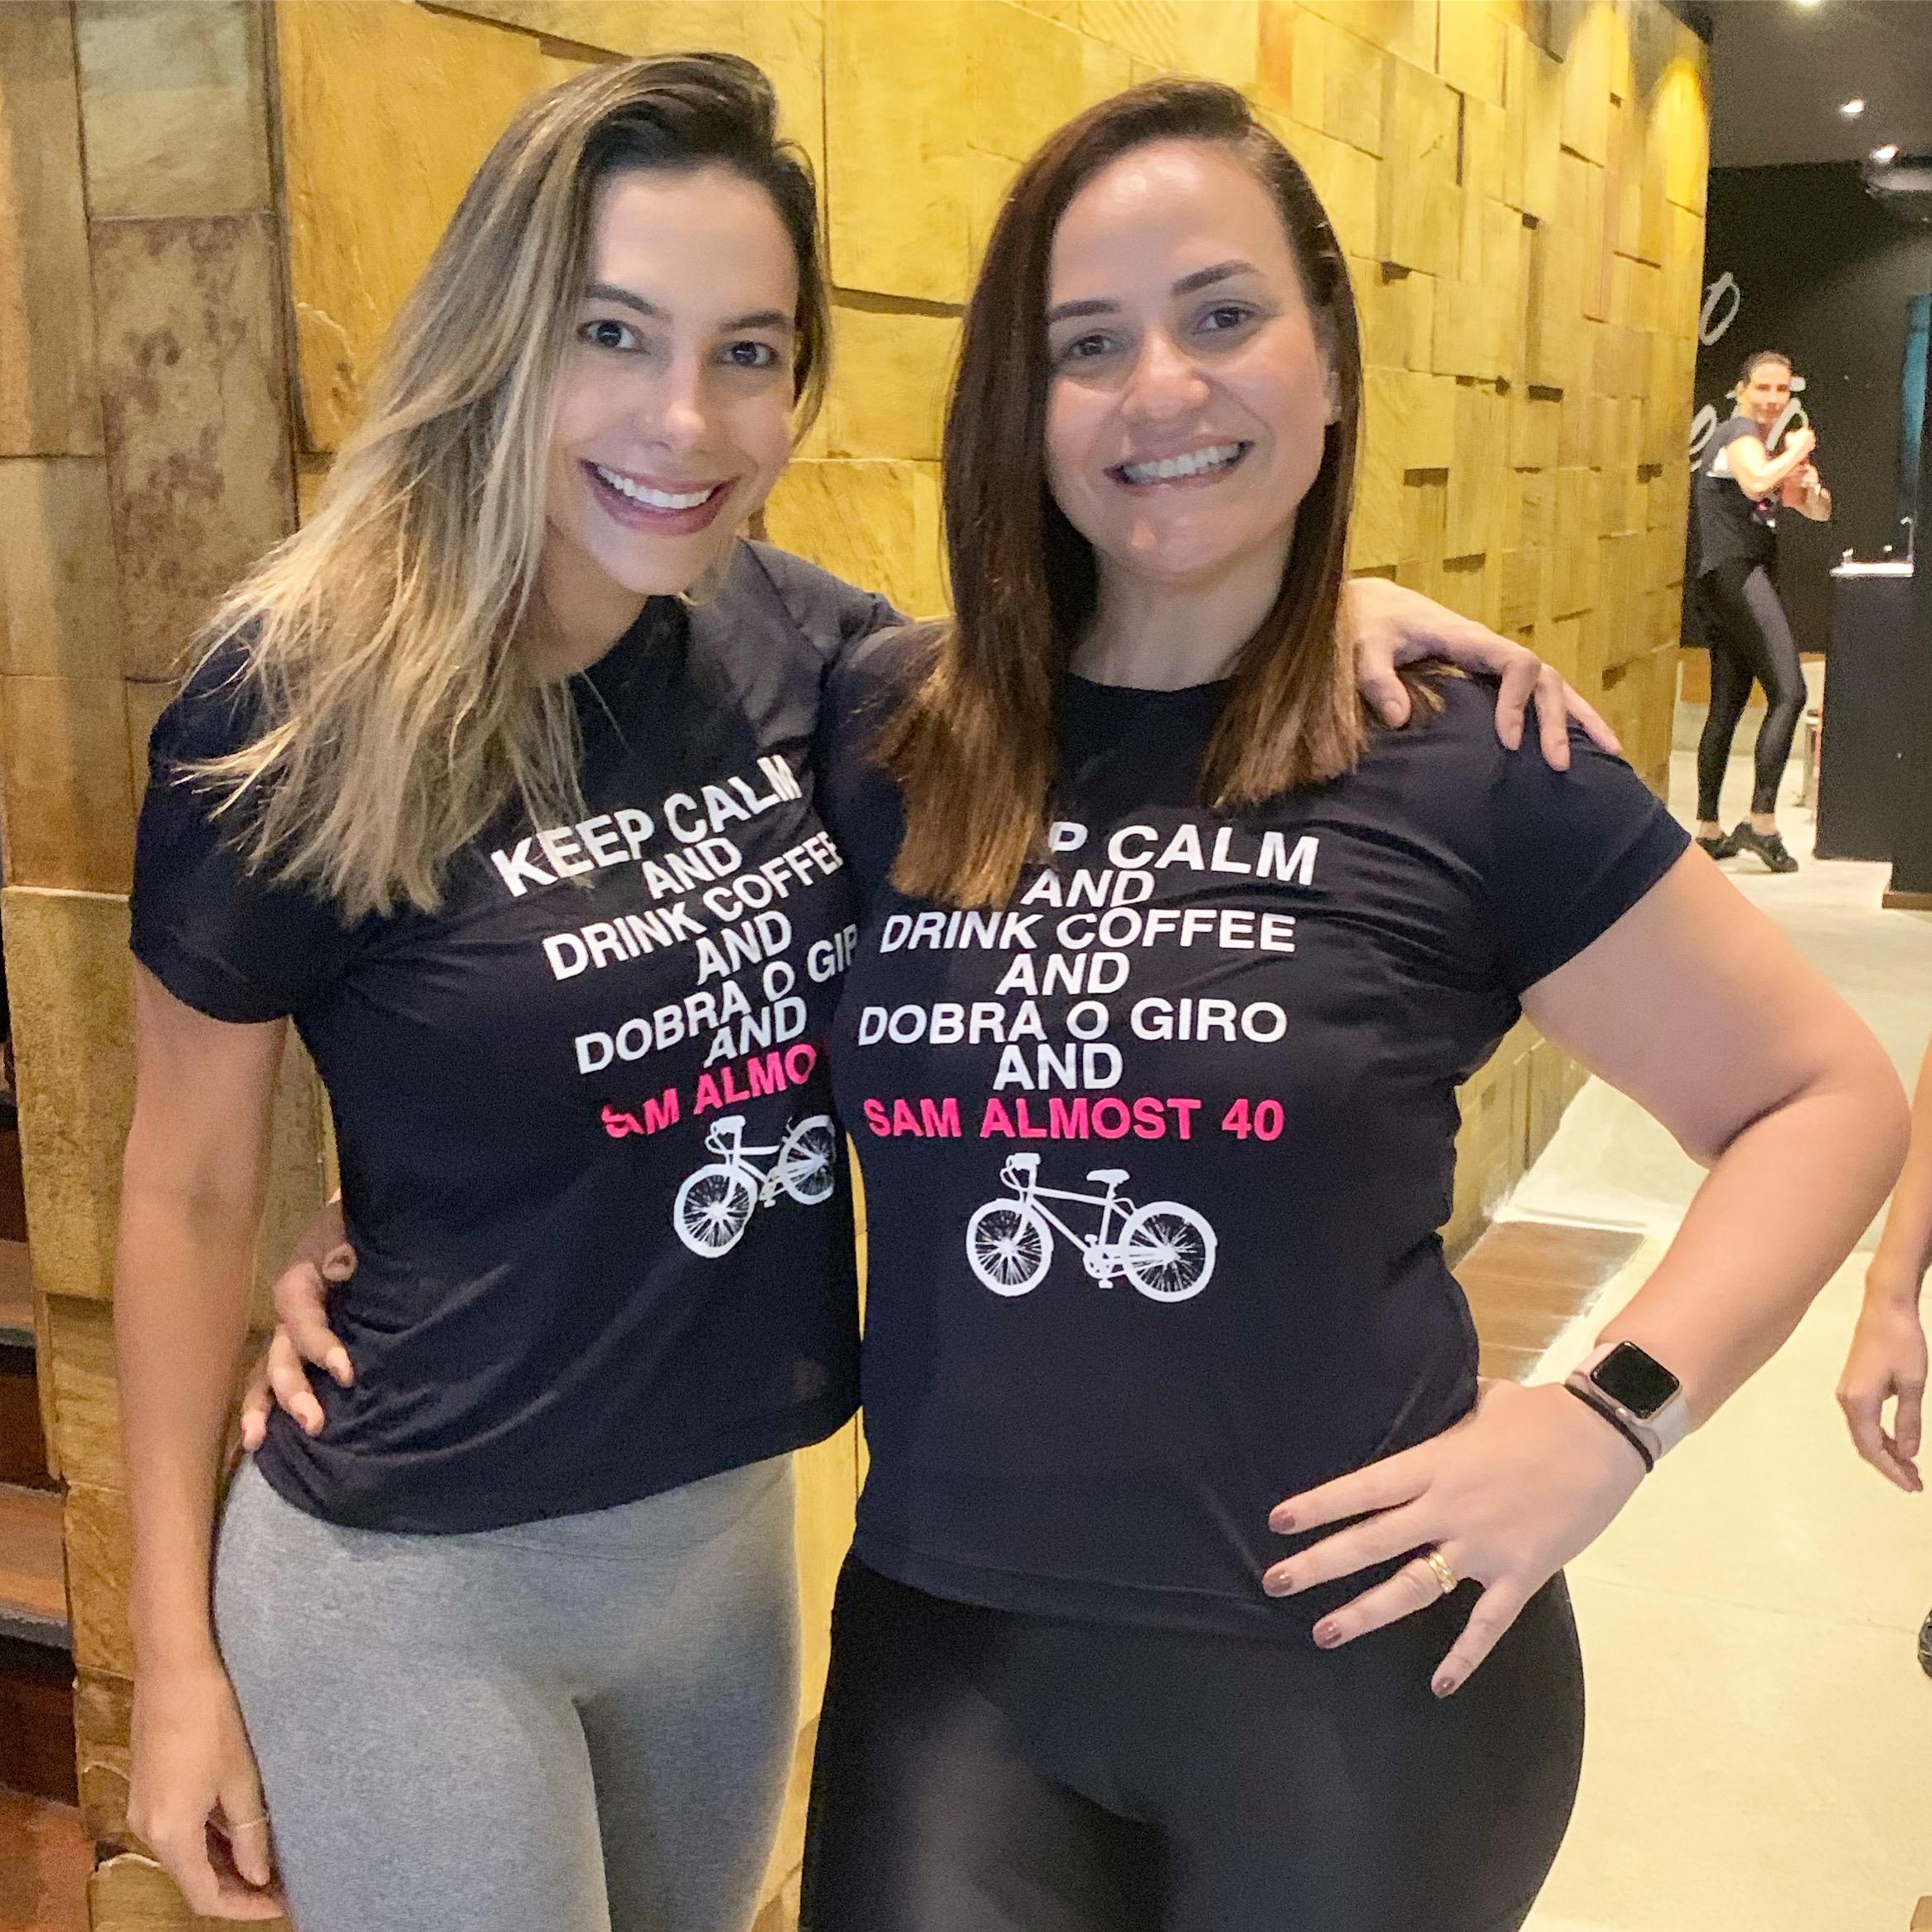 Dra Samira Mascarenhas e a prima Anacecilia Rocha